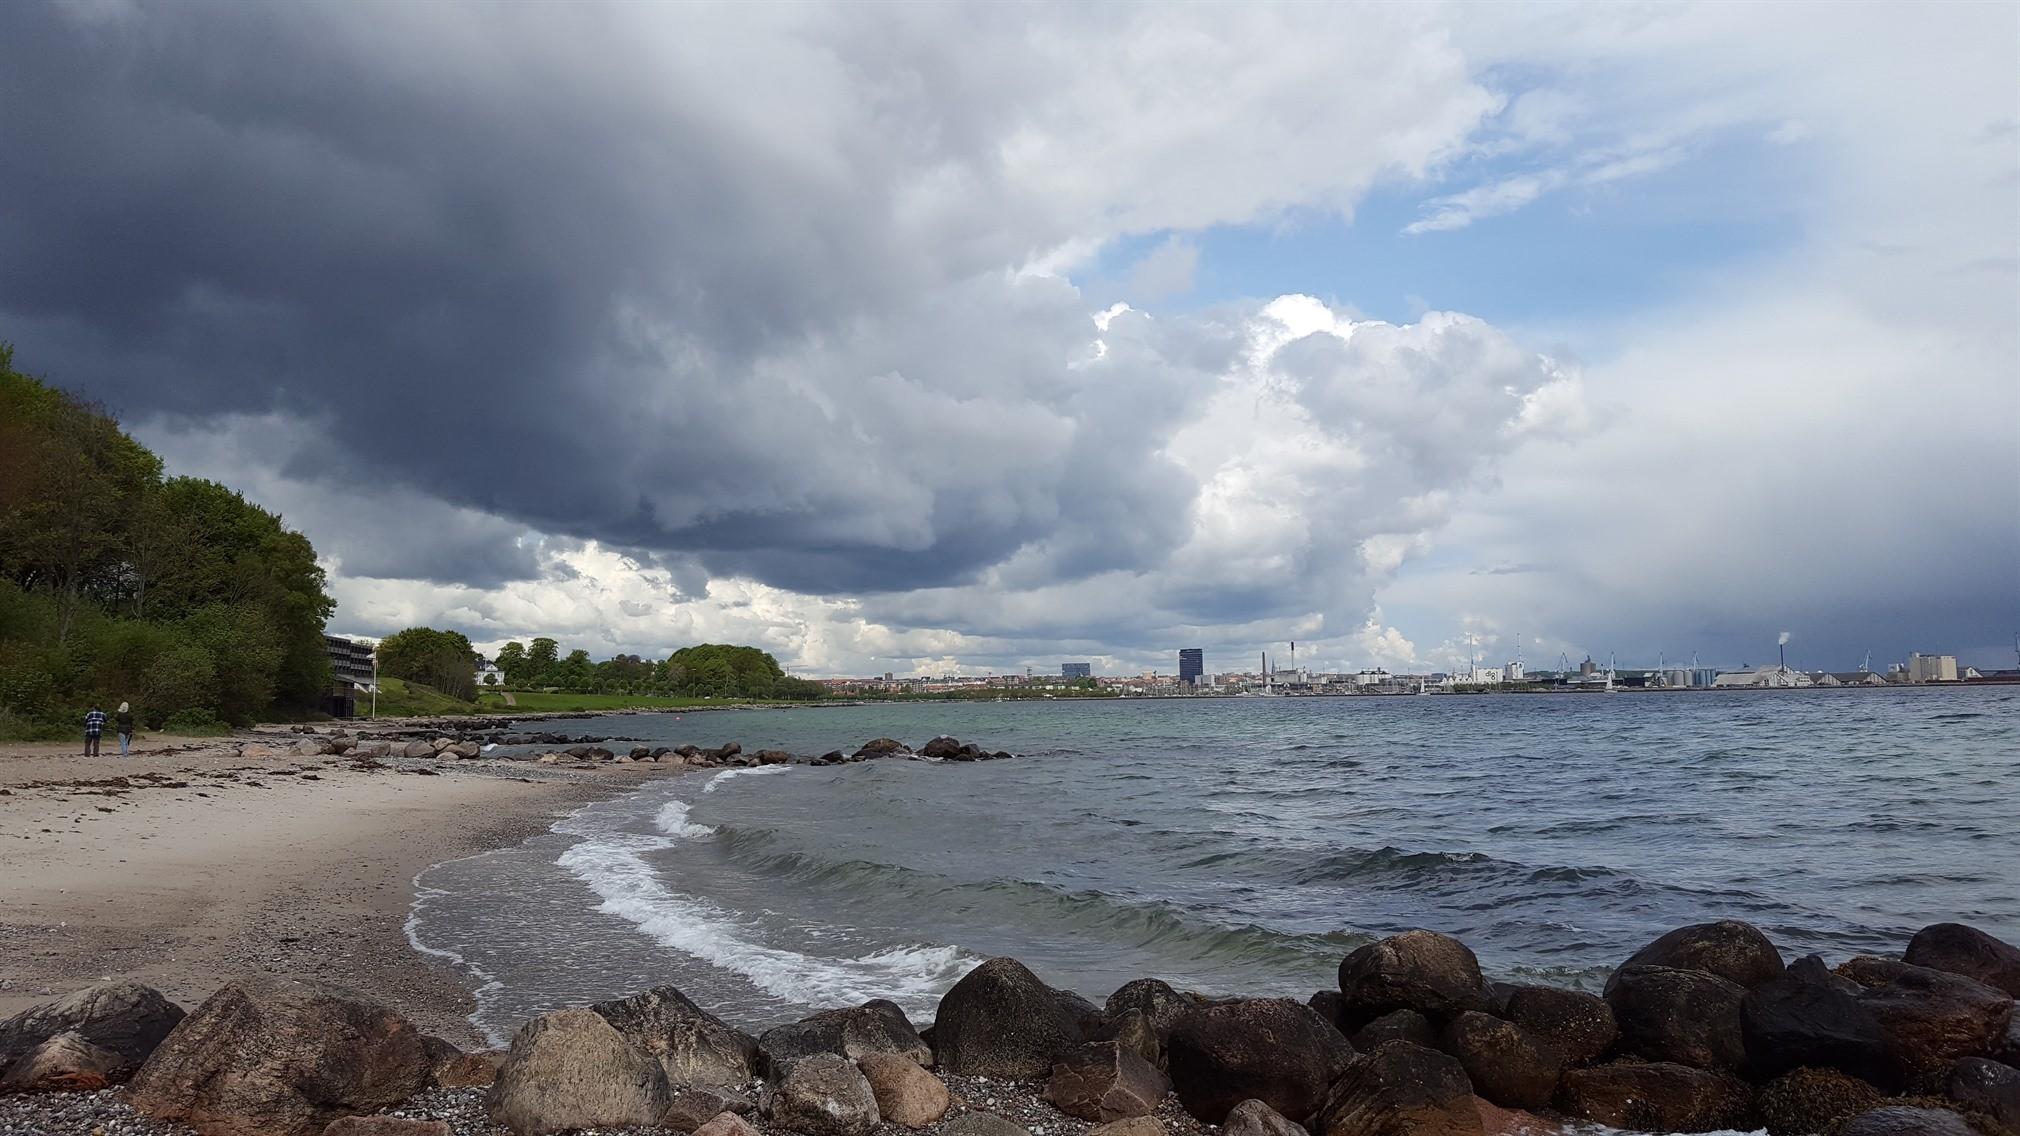 Regn skyer Aarhus maj